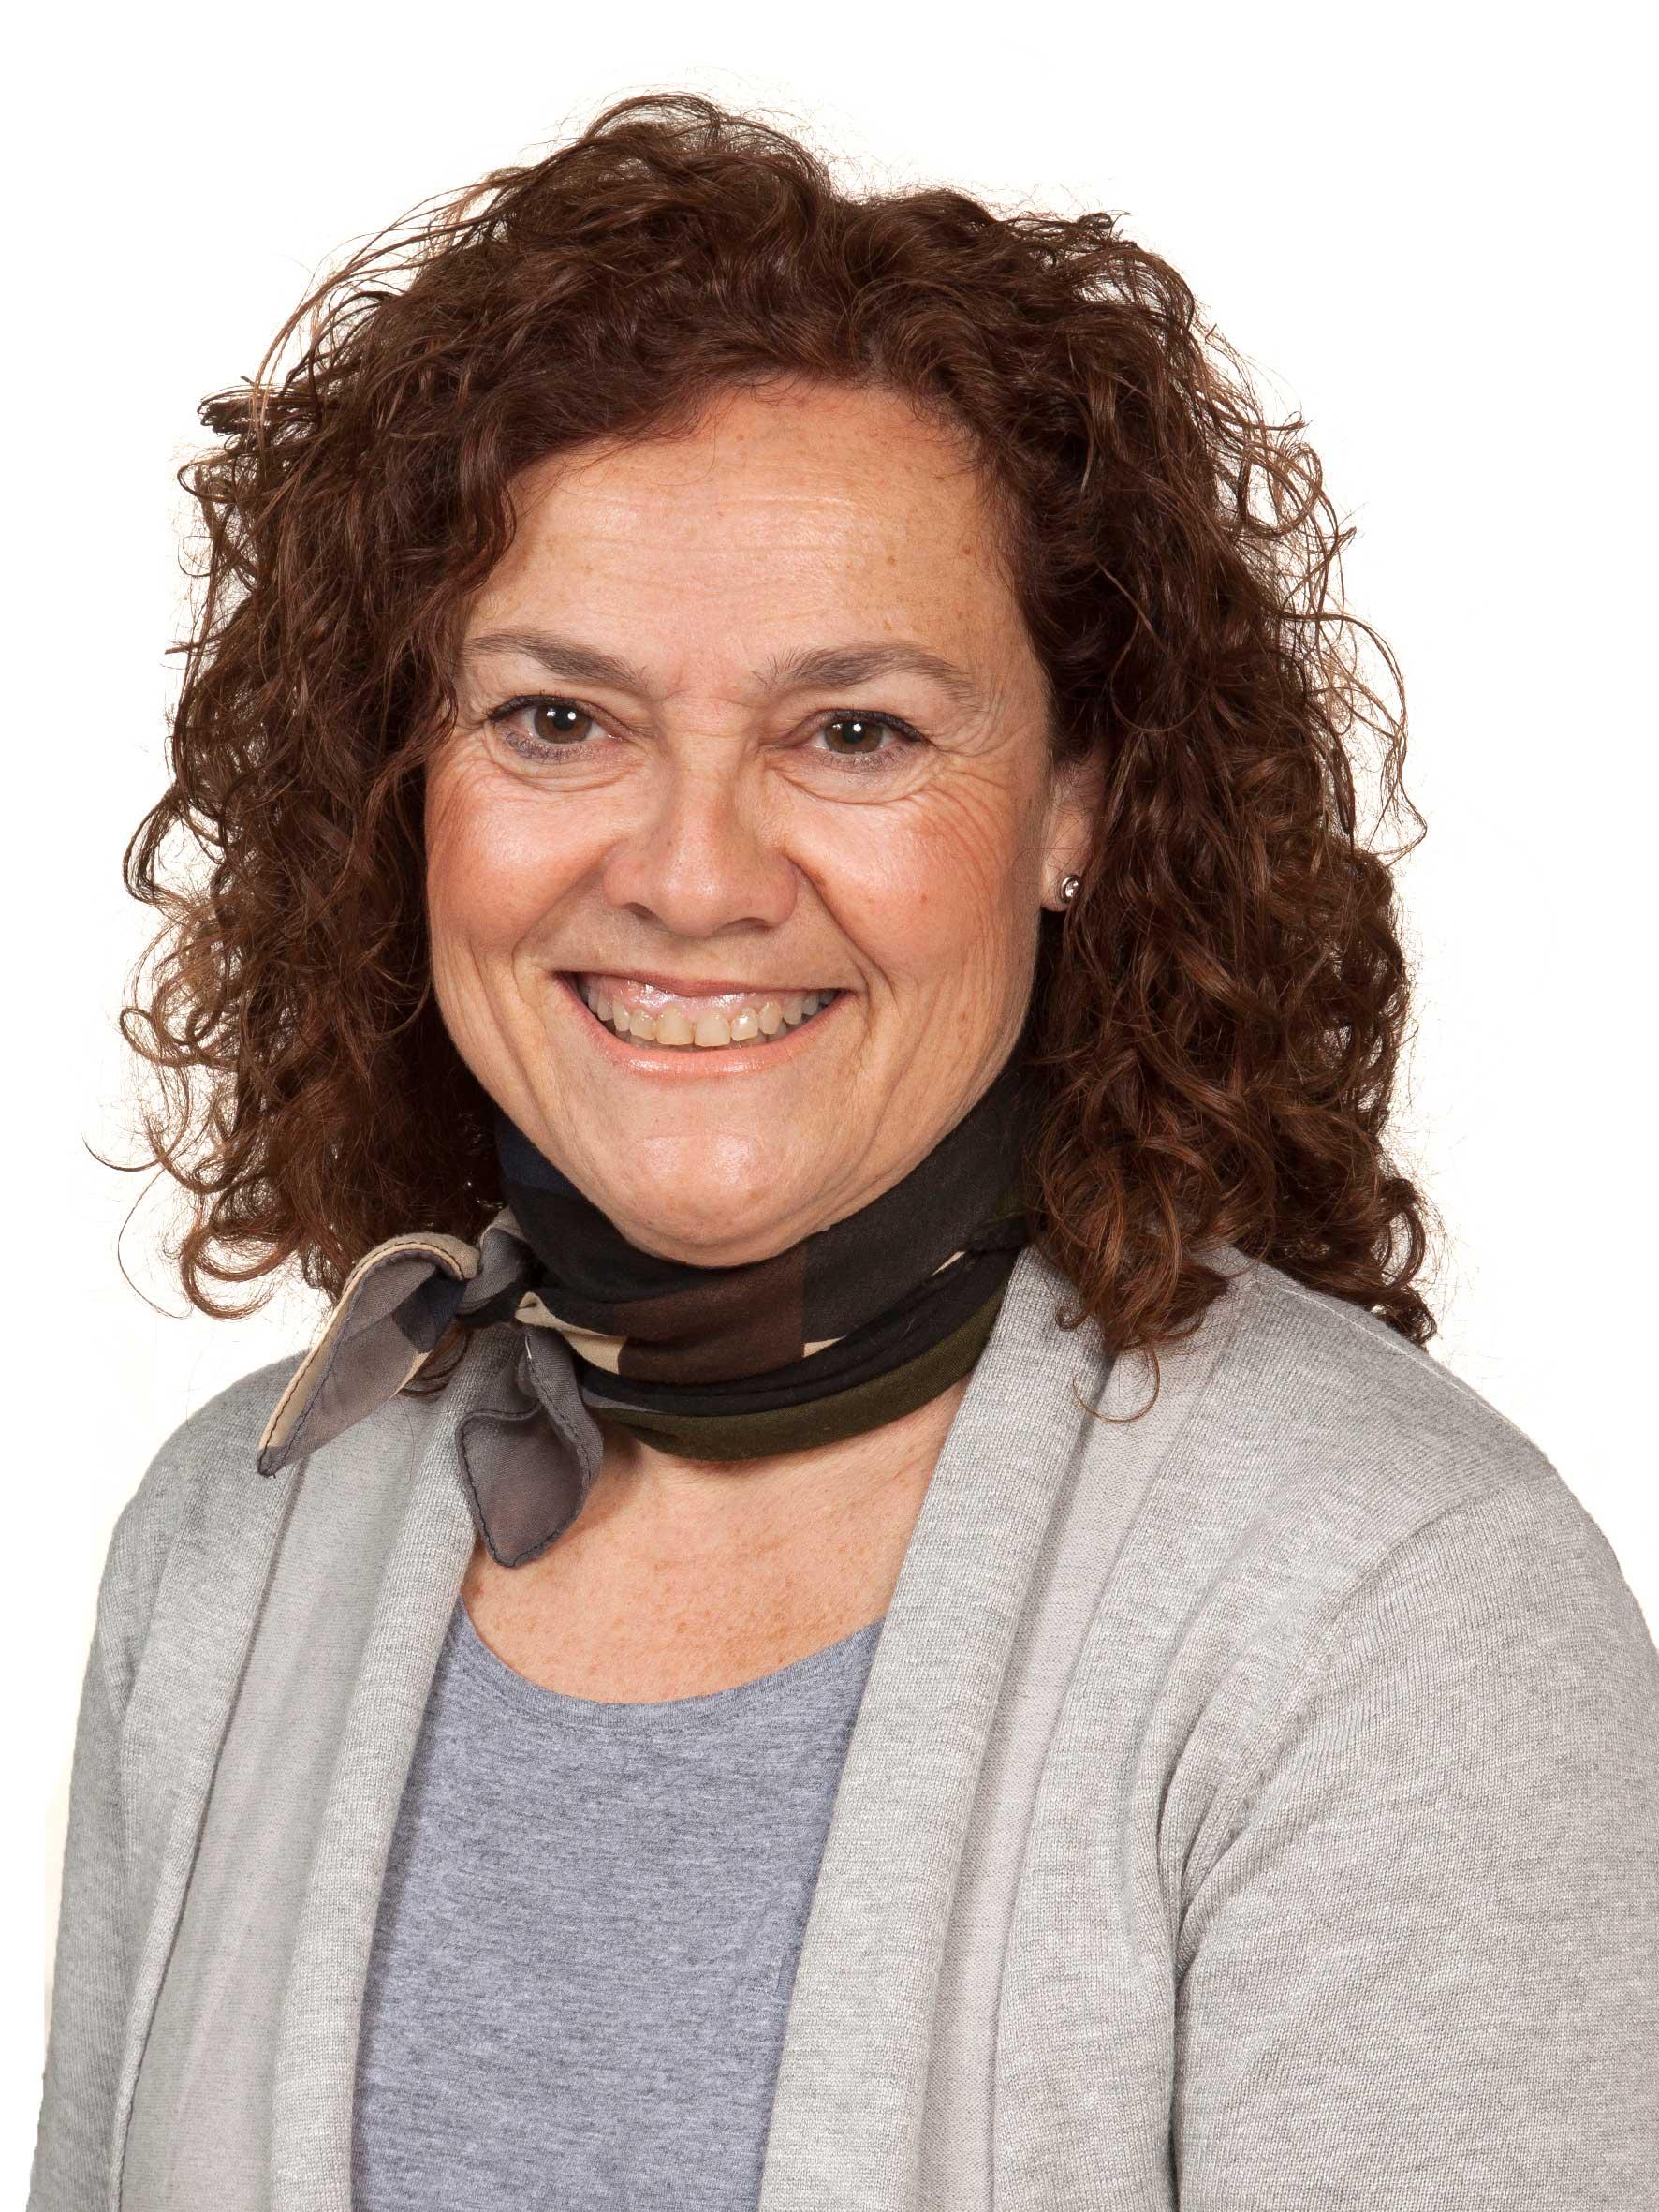 María José Ordóñez